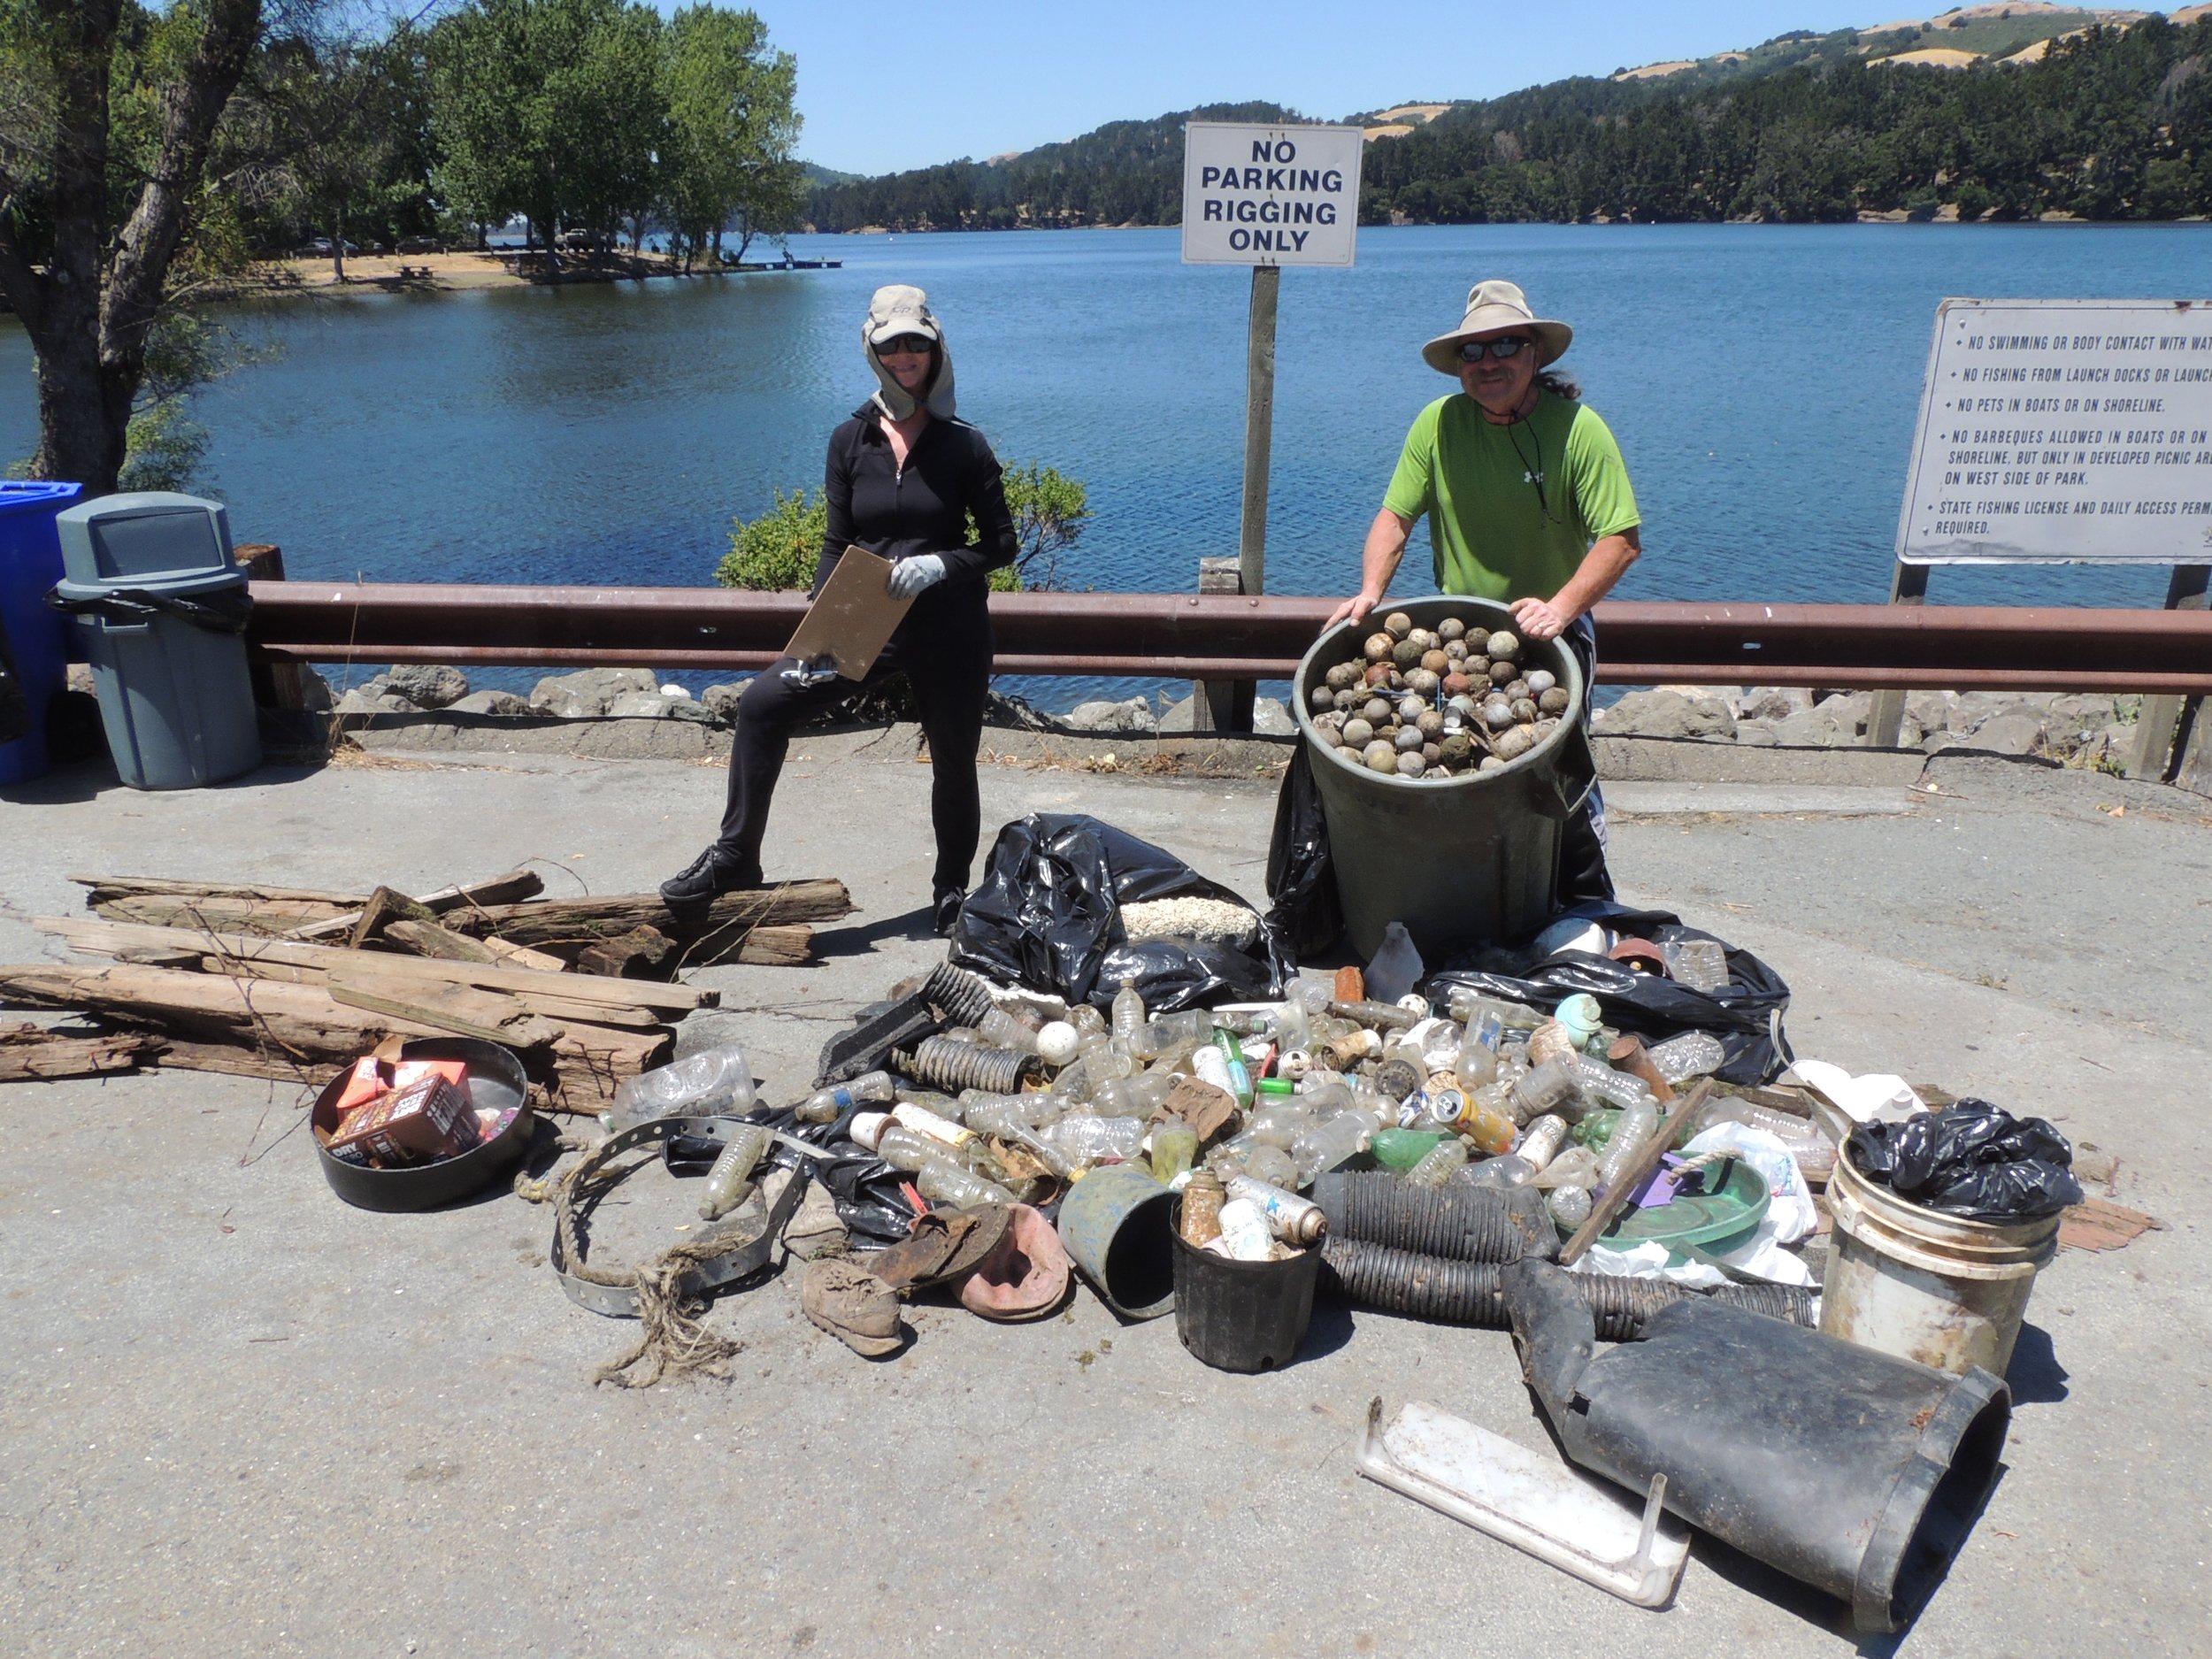 Litter removed from San Pablo Dam Reservoir 2018